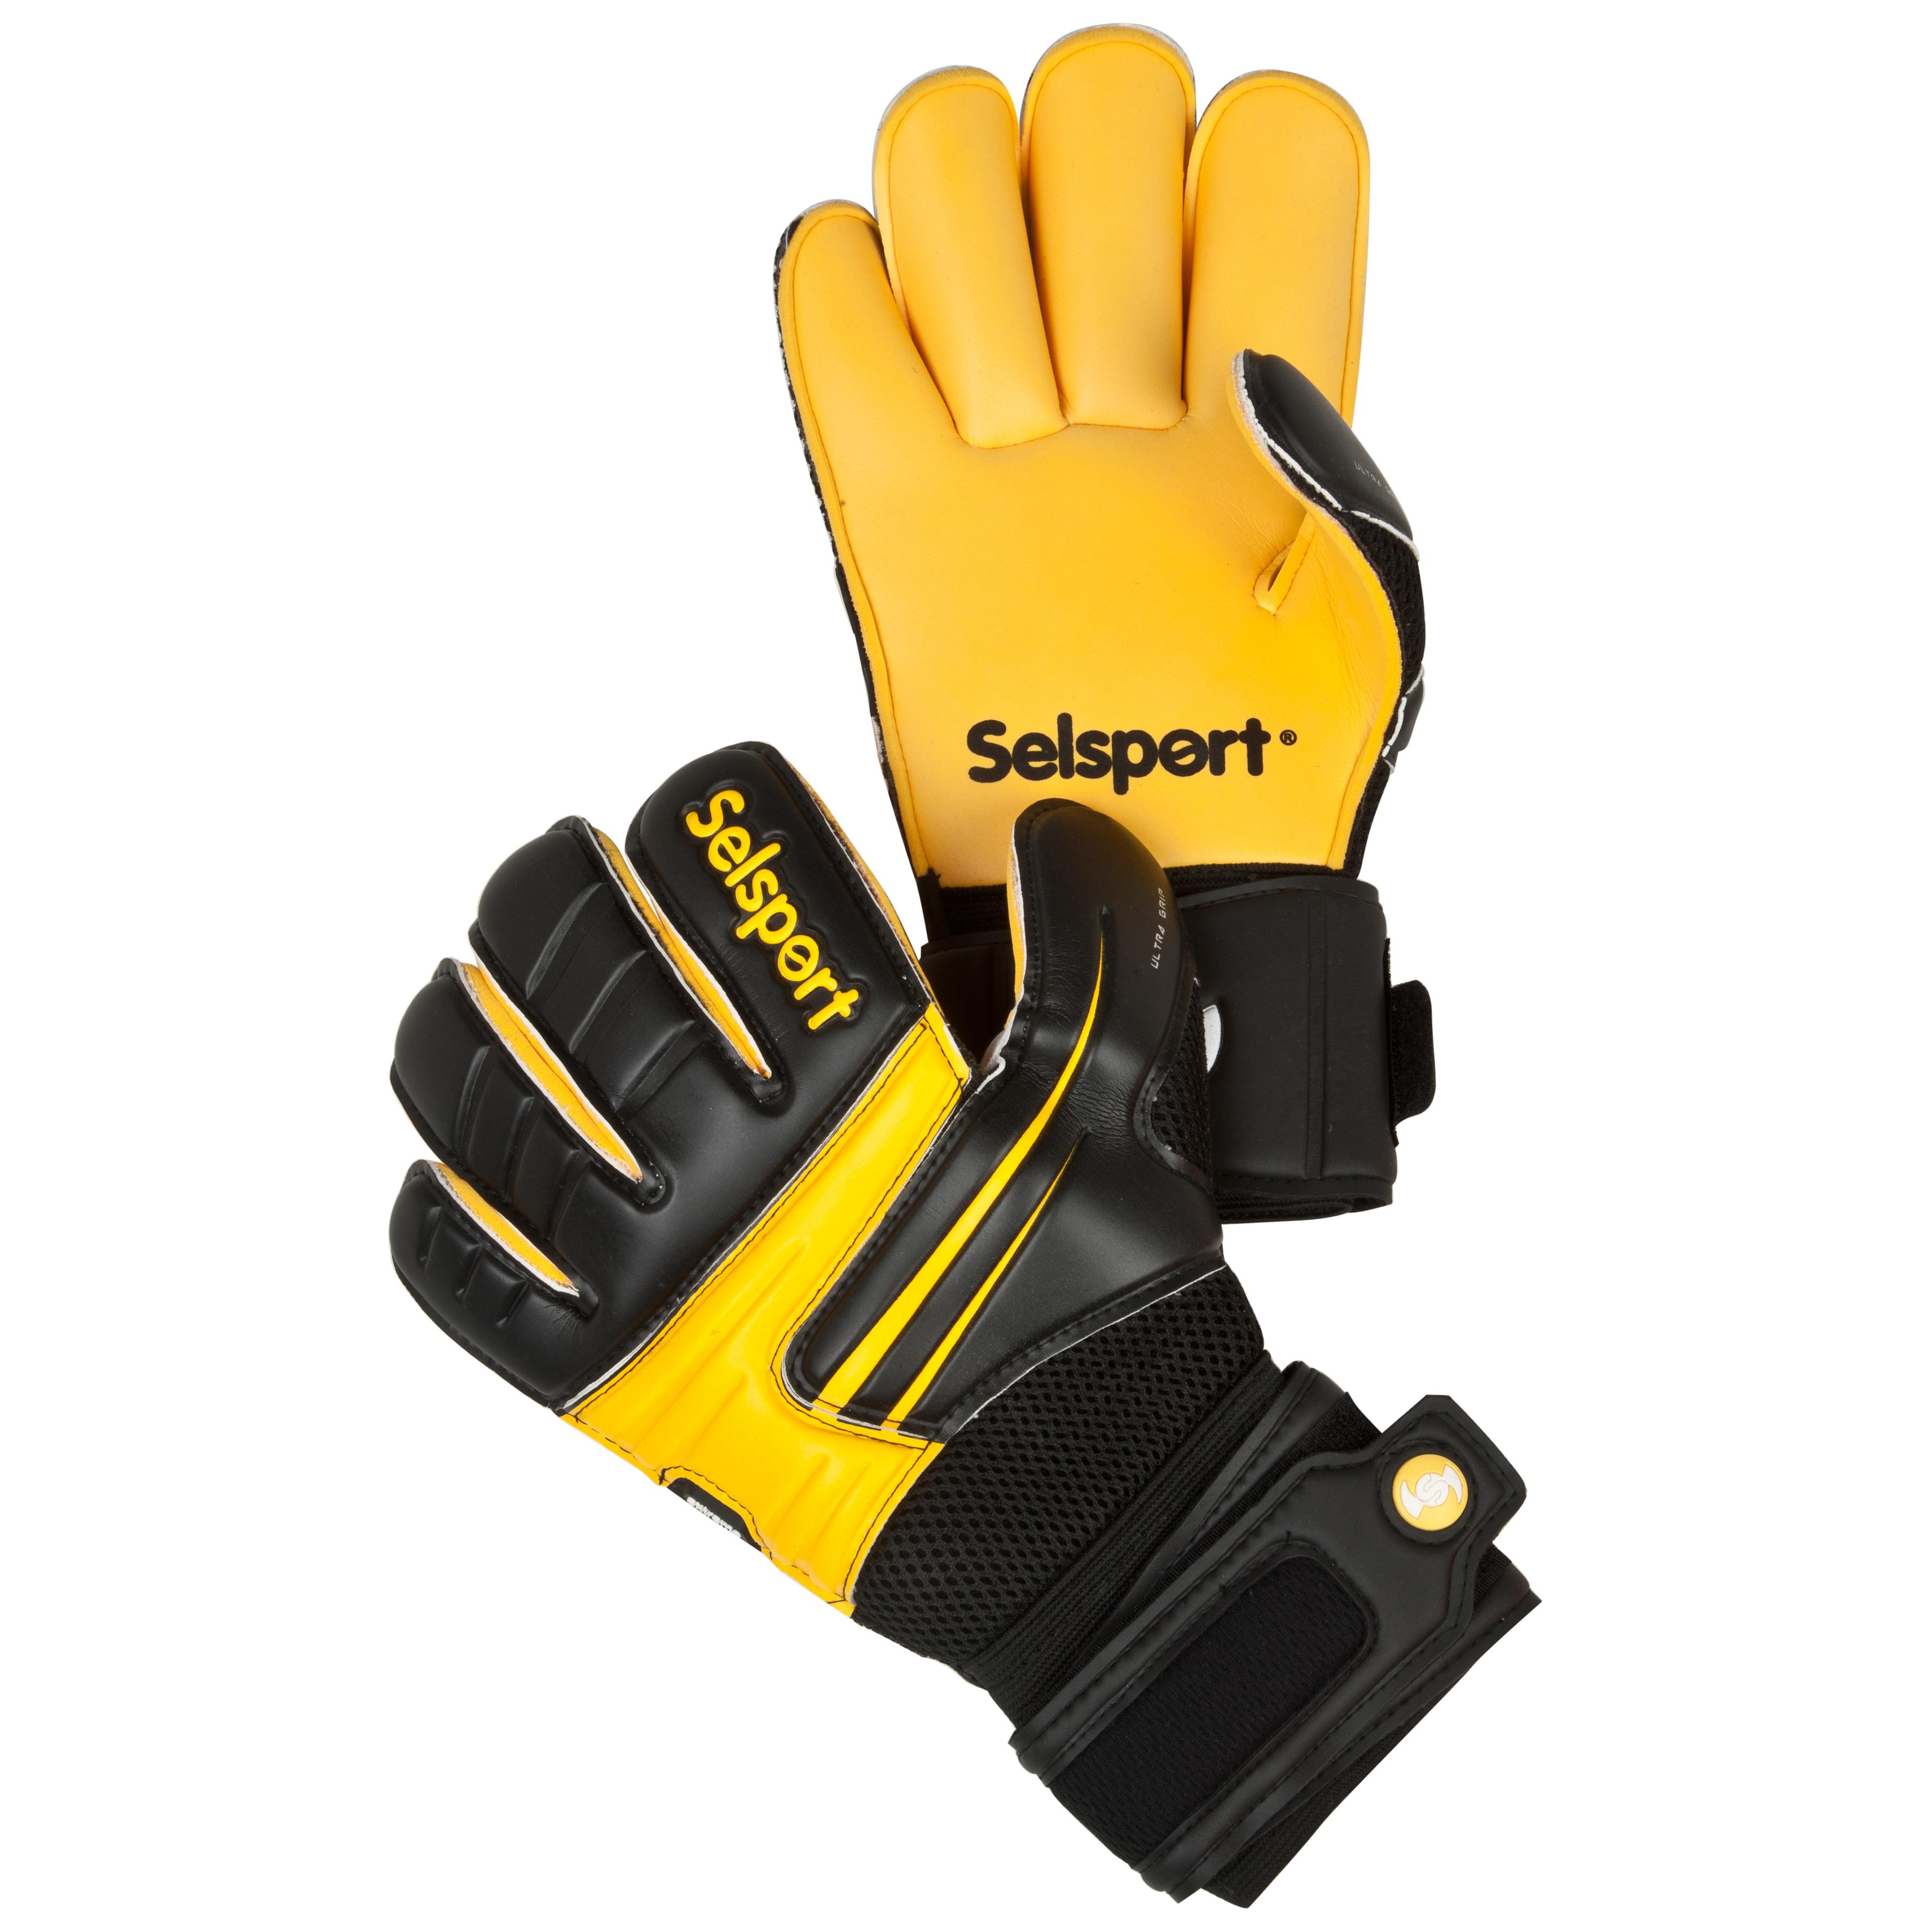 Selsport Extreme 7 Goalkeeper Gloves - Black/Yellow